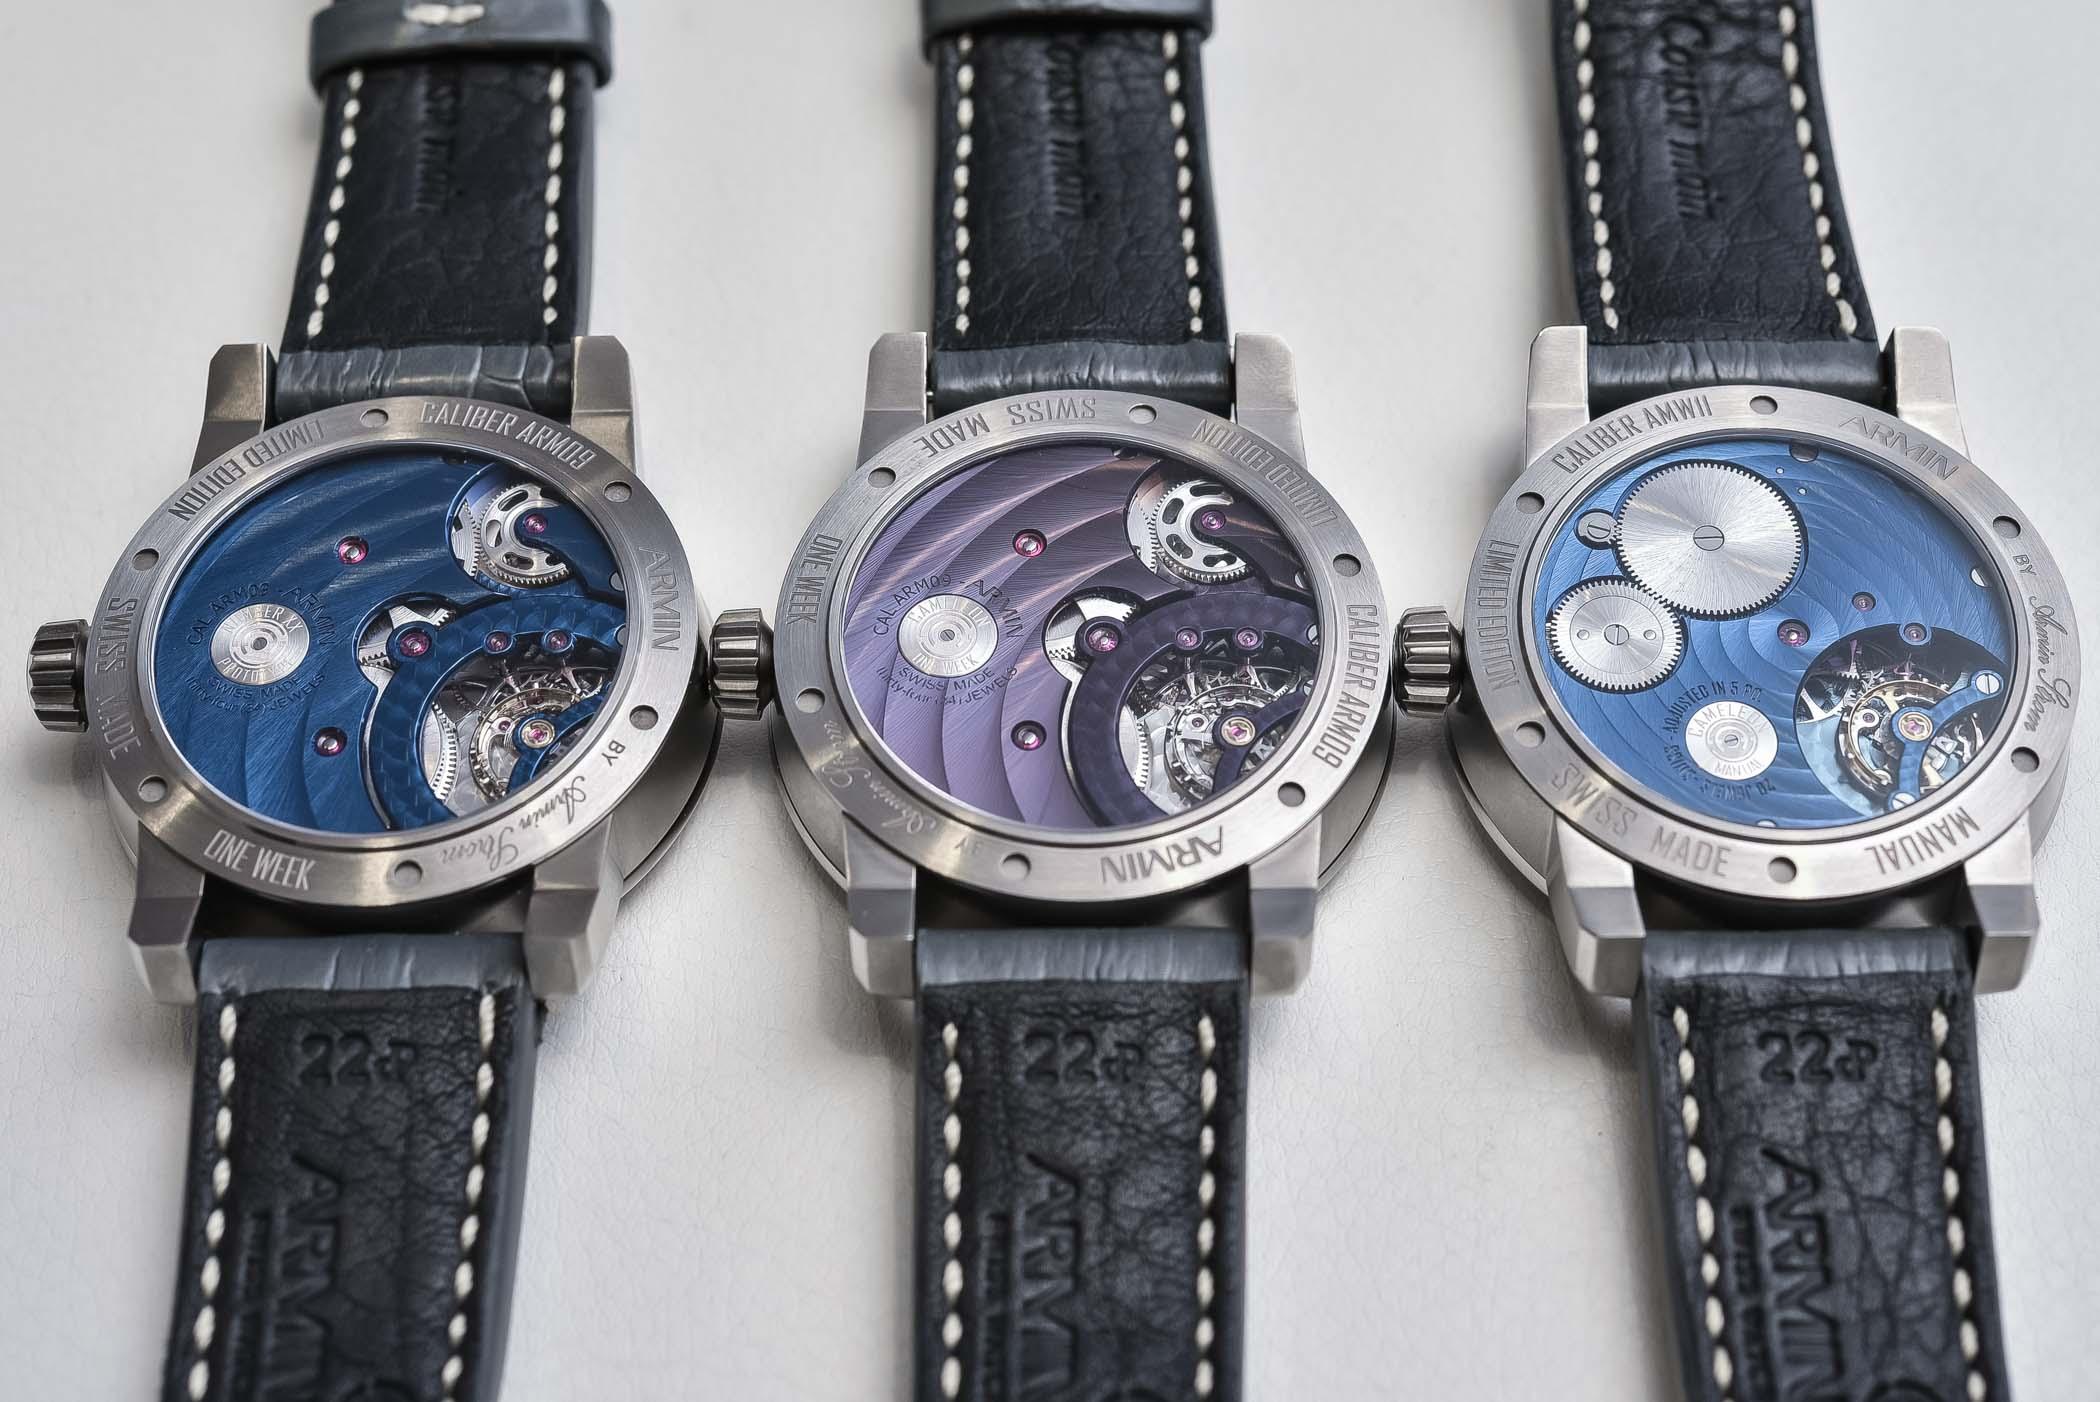 Armin Strom Watch Configurator